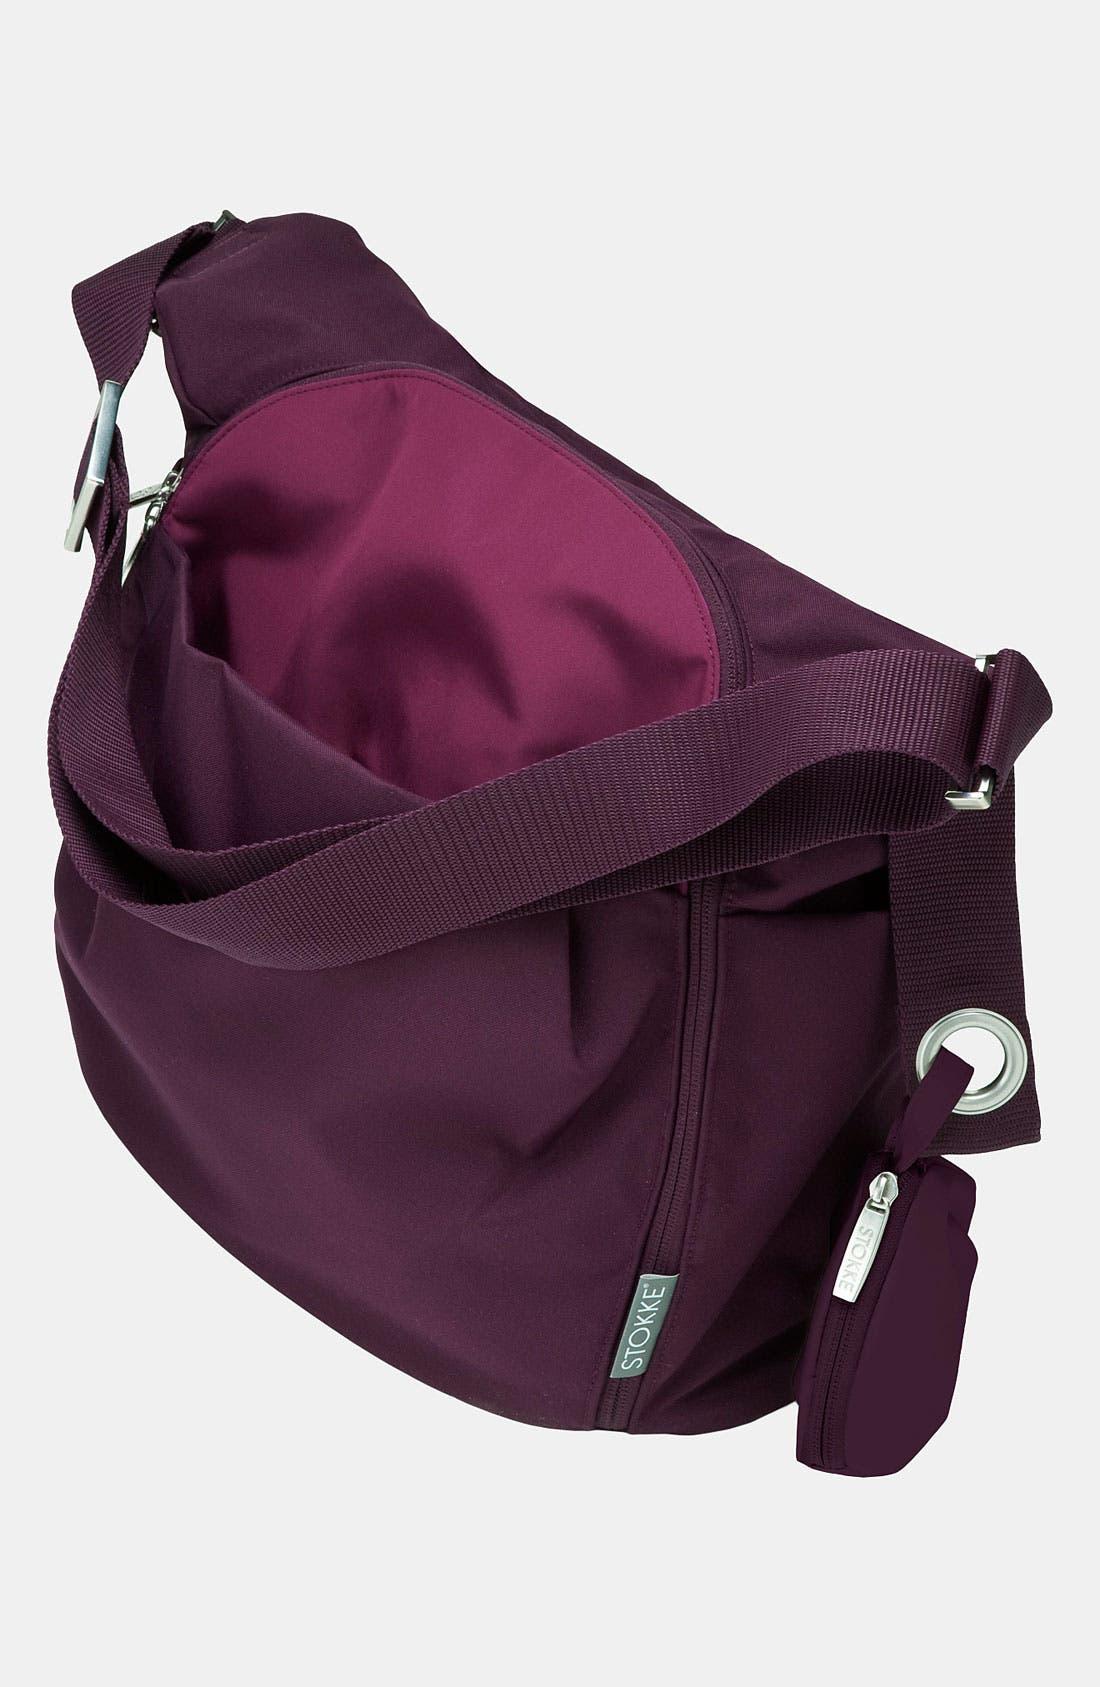 Stokke Baby 'Xplory®' Changing Bag